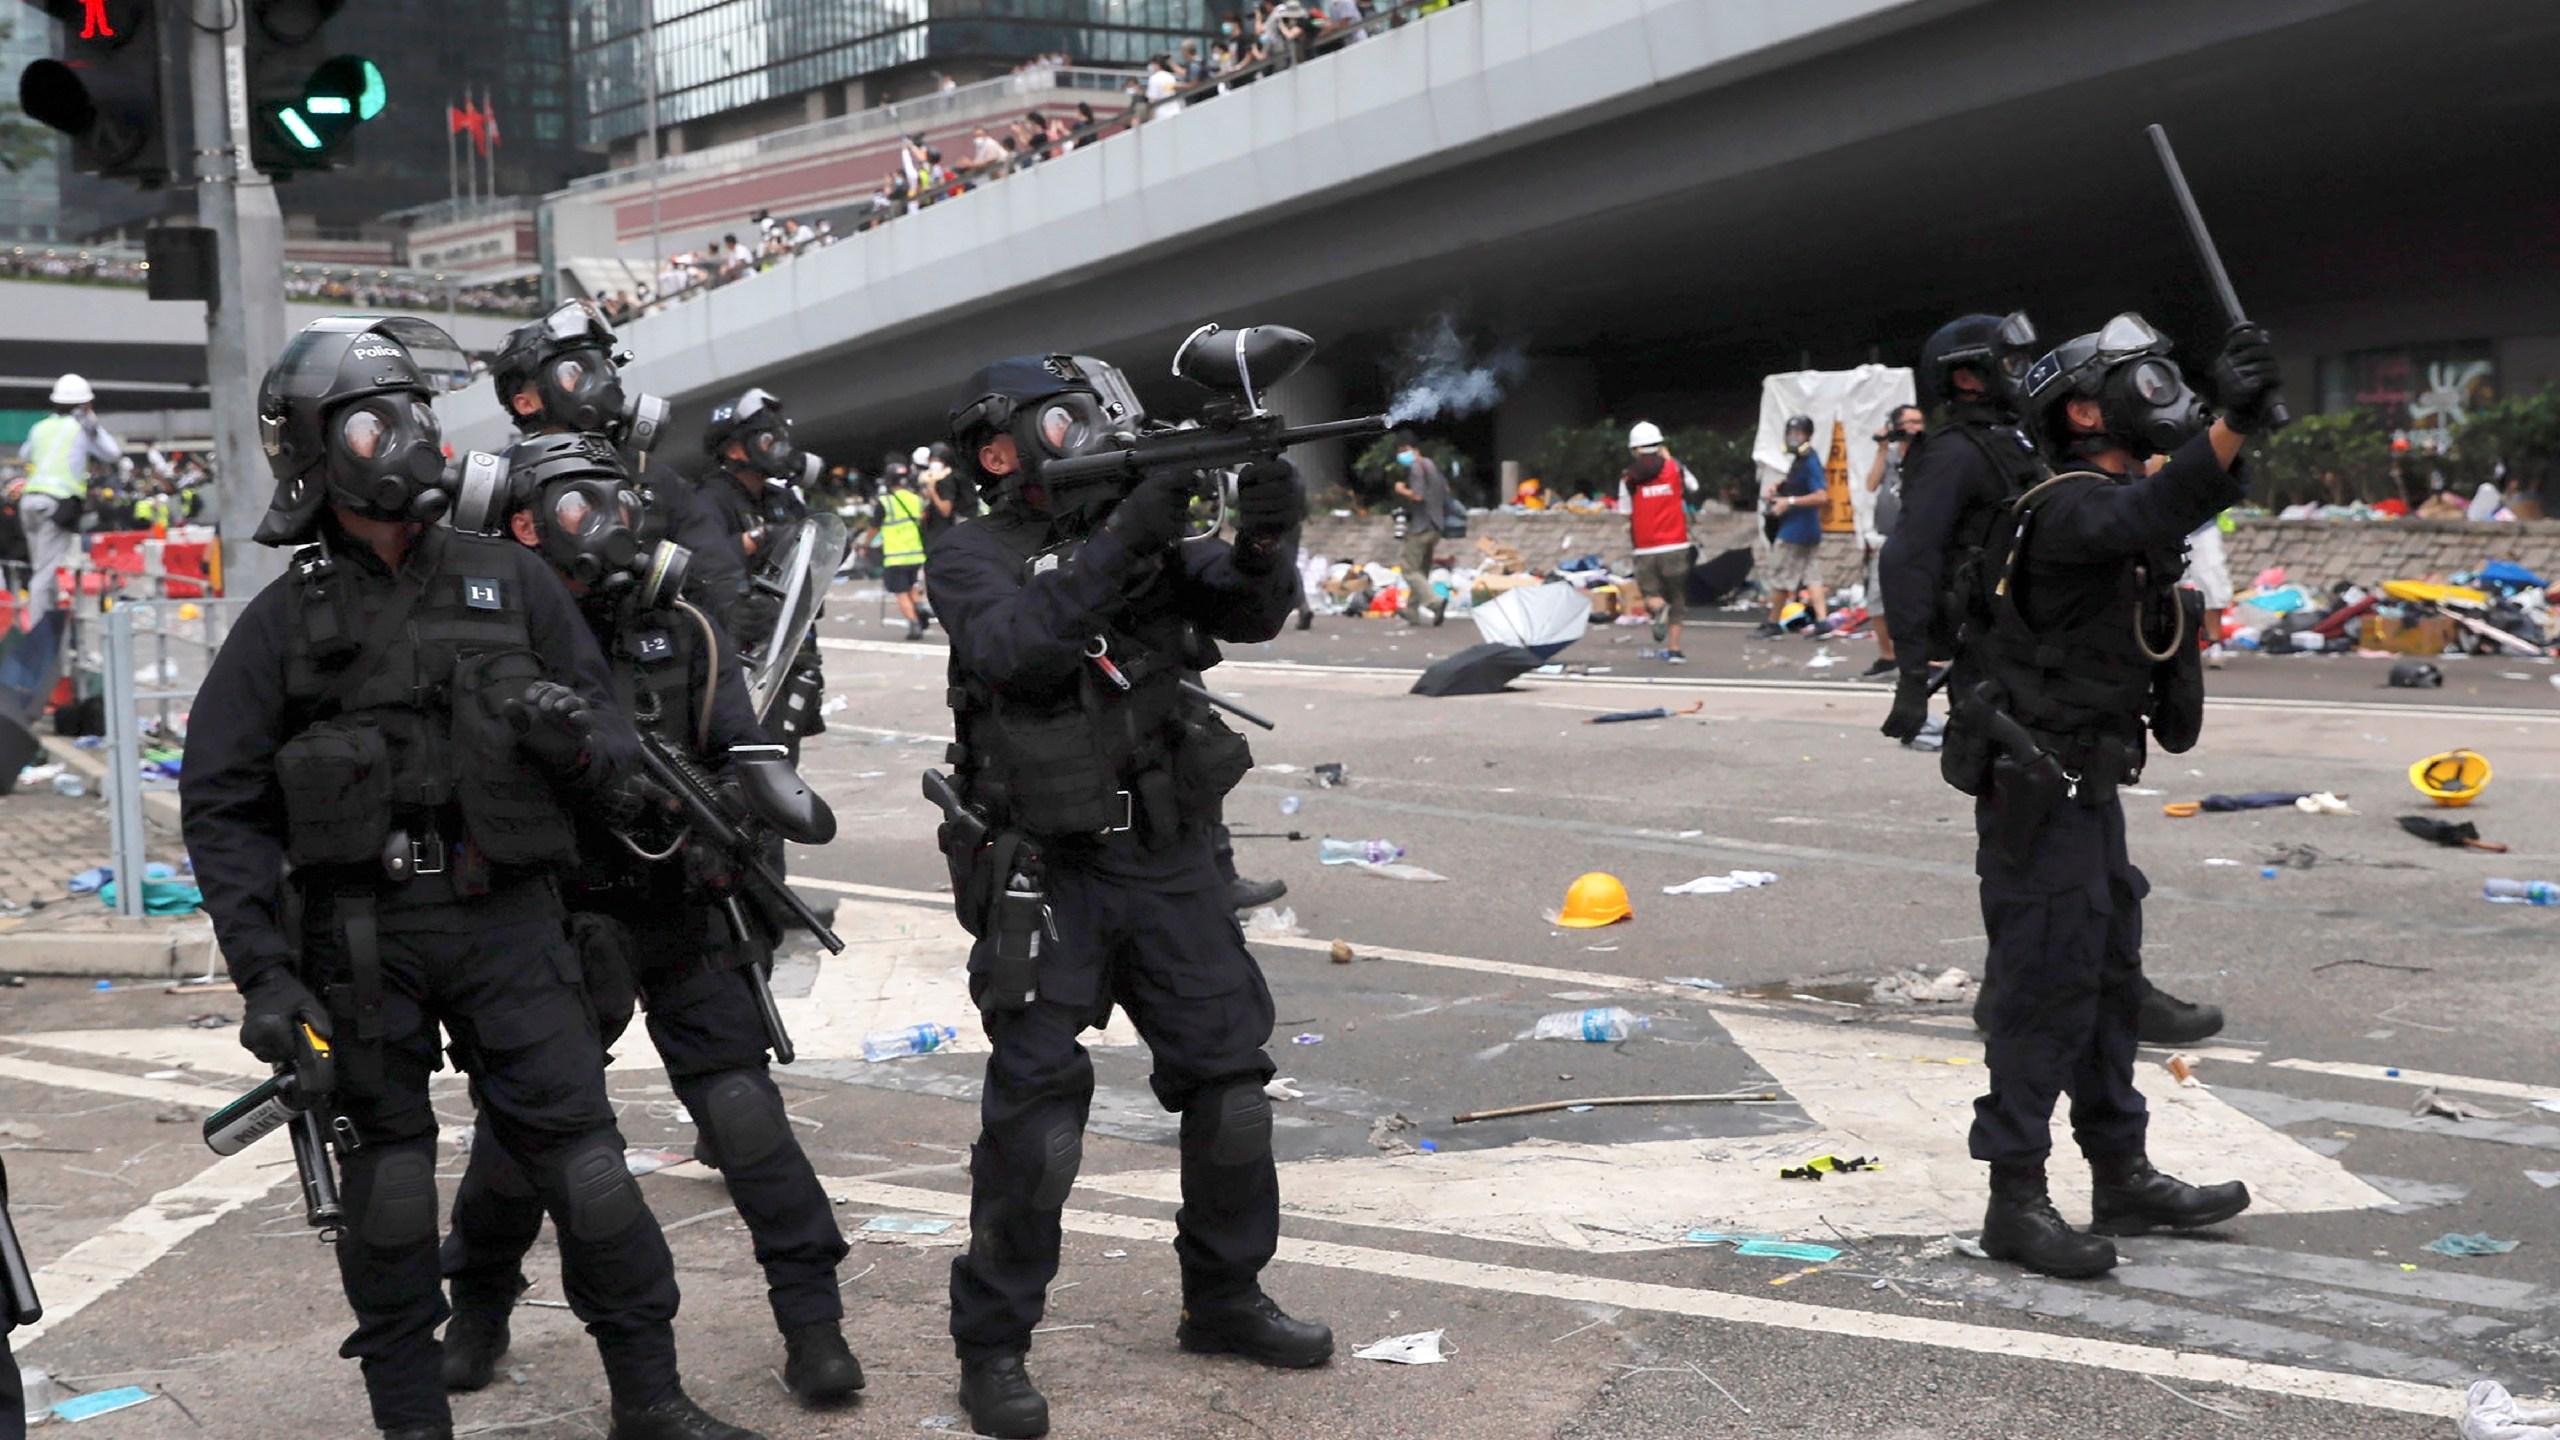 Hong_Kong_Extradition_Law_Police_Tactics_25418-159532.jpg43607018